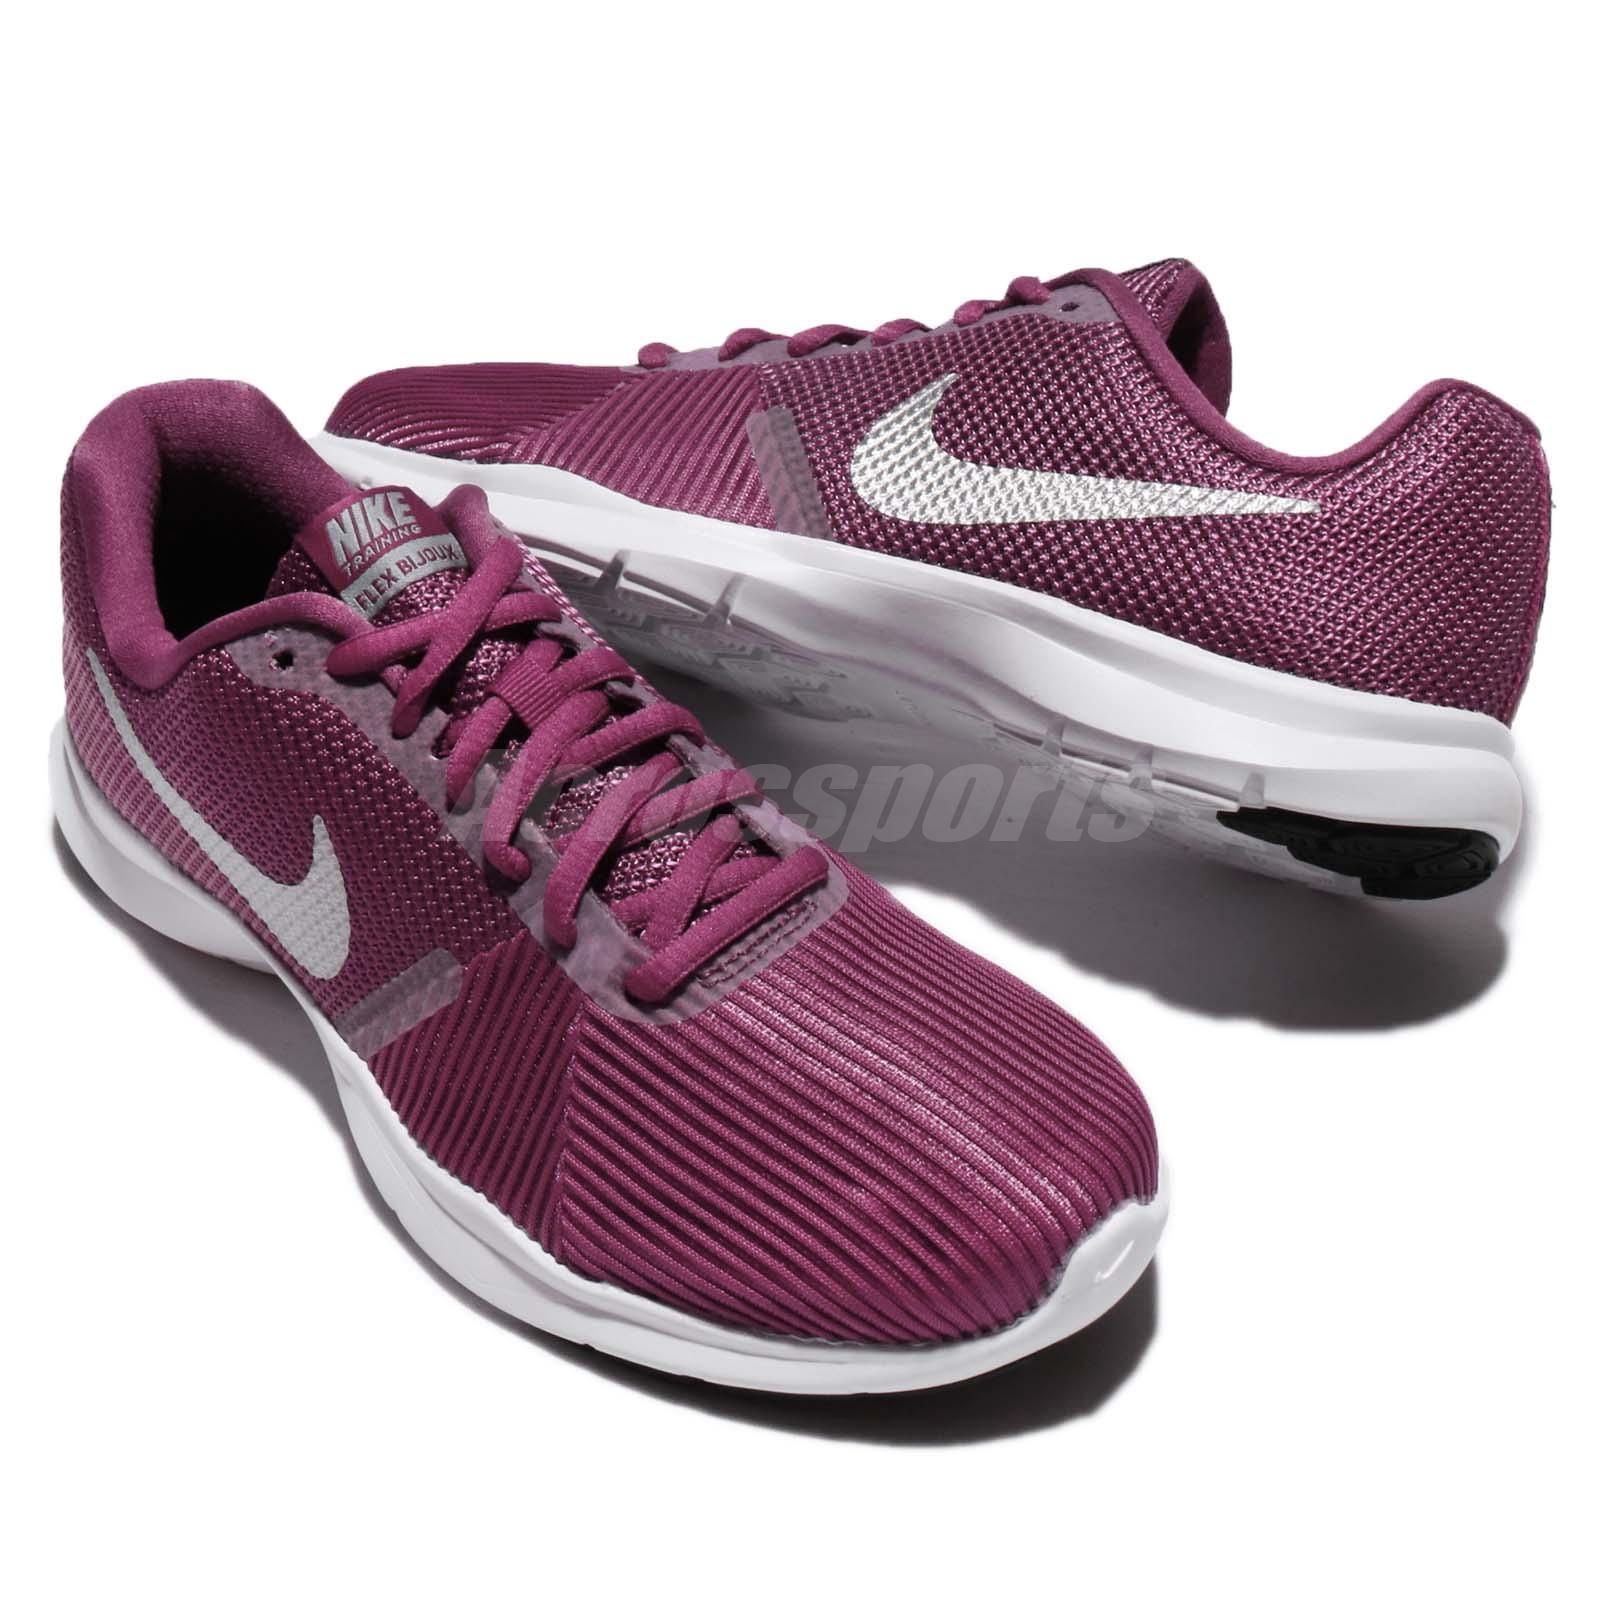 Nike Wmns Flex Bijoux Tea Berry Metallic Silver Women Training Shoes ... d85373f4c10